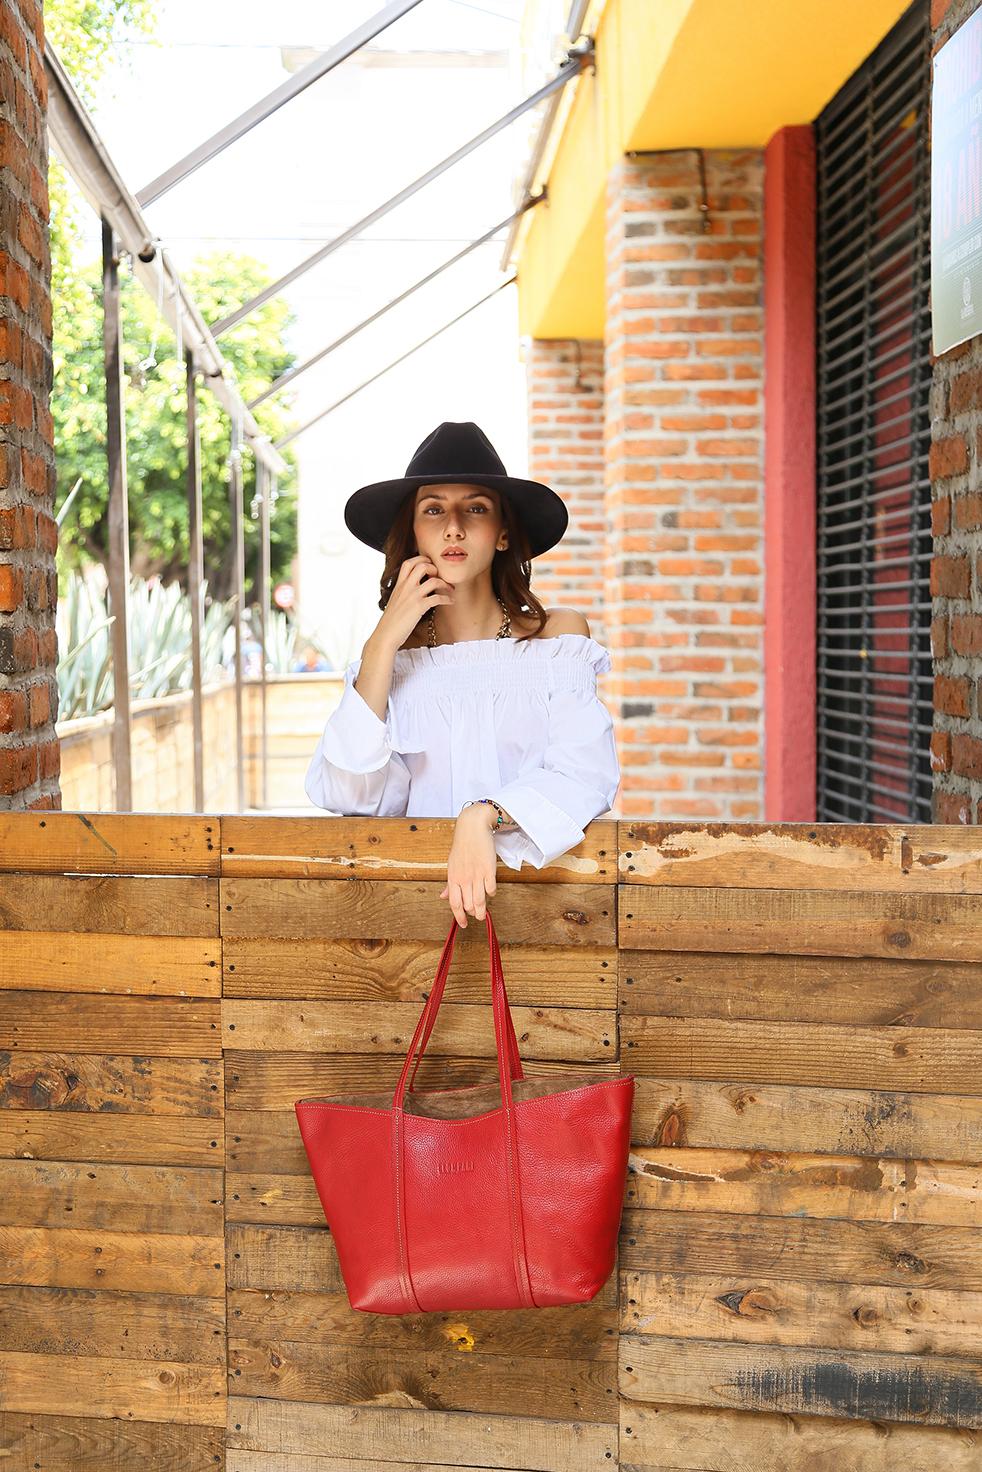 Maroge-Angela-Velazquez-fotografia-sesiones-diseño-36